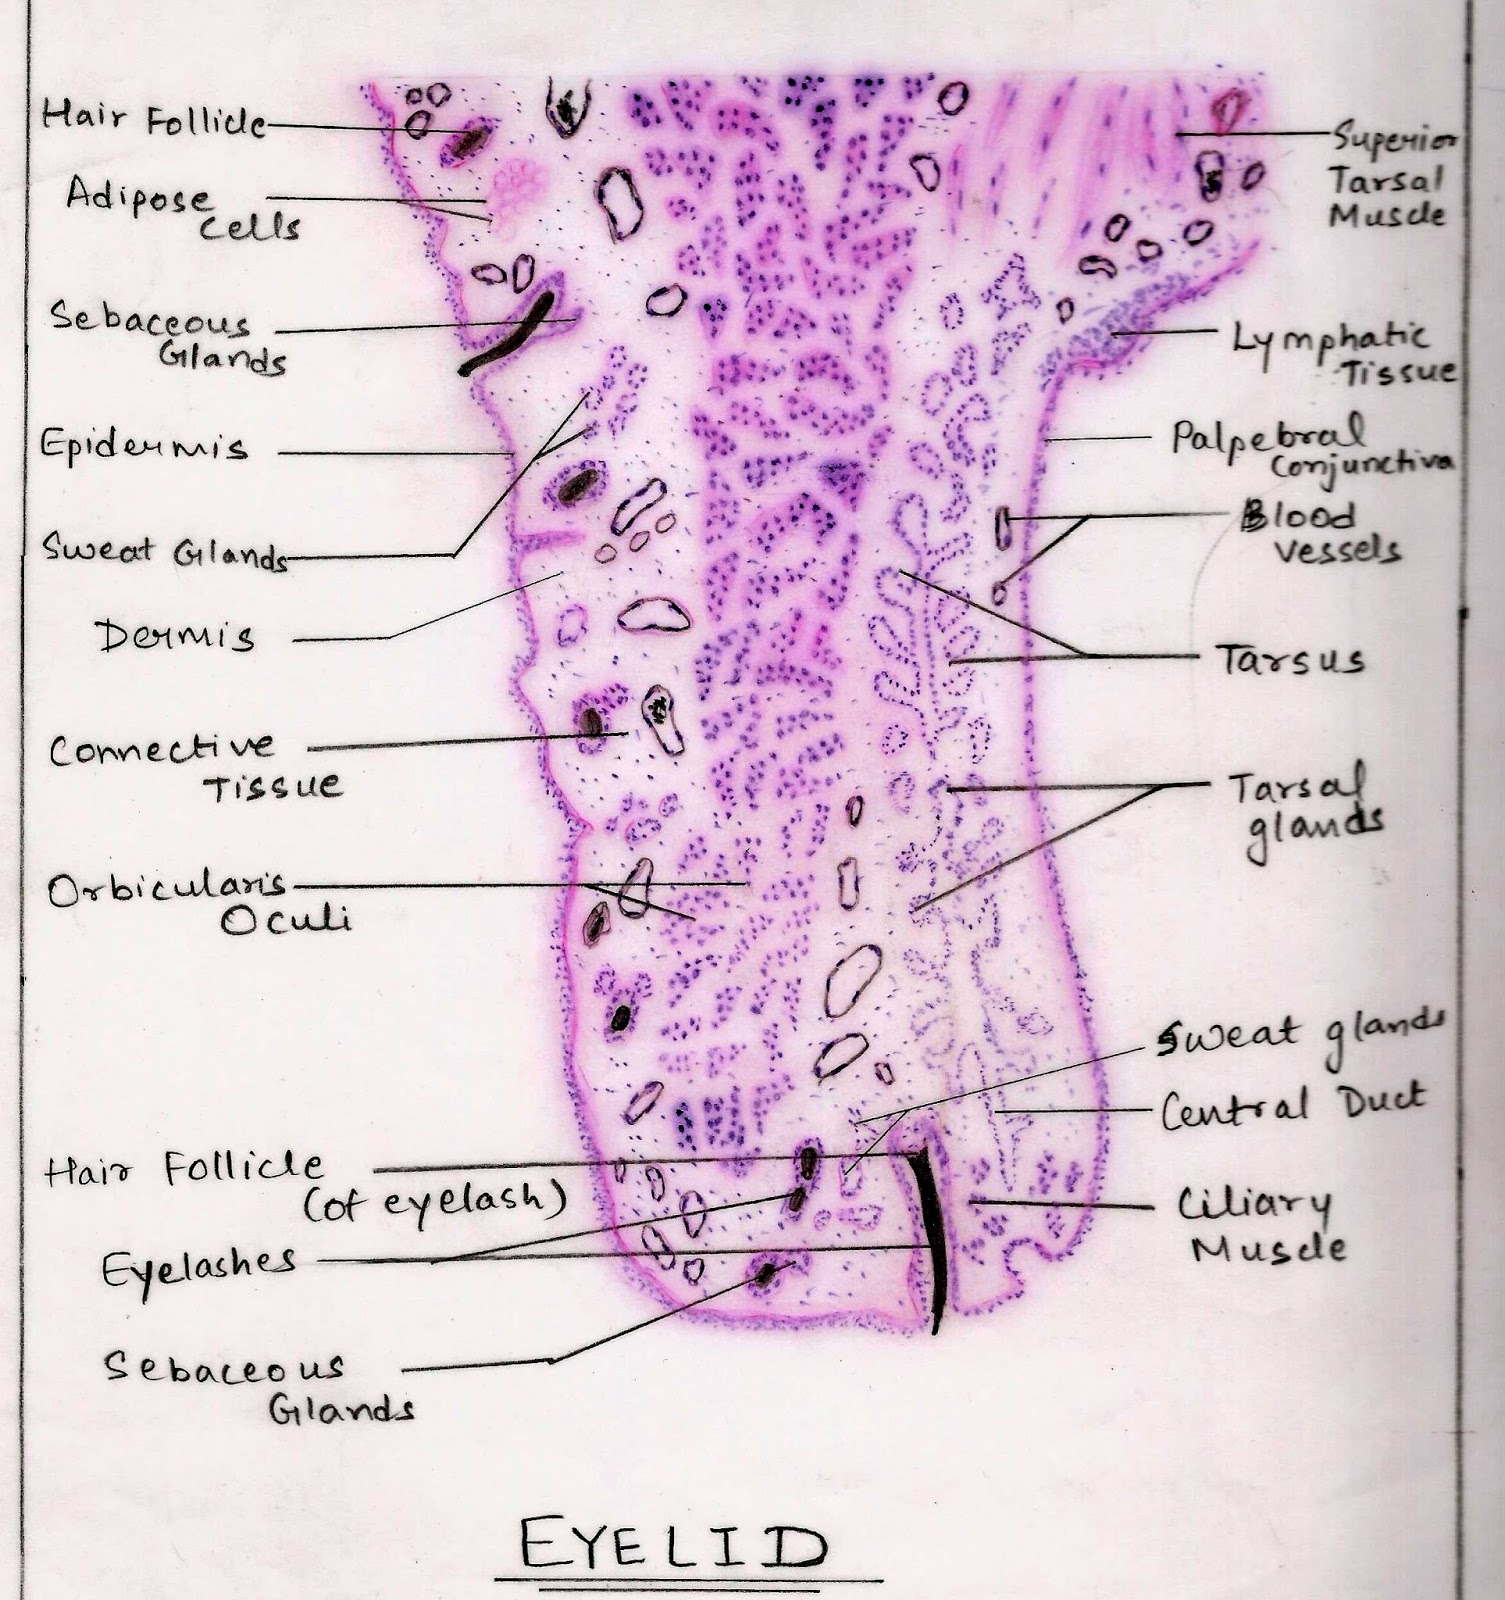 Histological Diagram Of Eyelid - House Wiring Diagram Symbols •